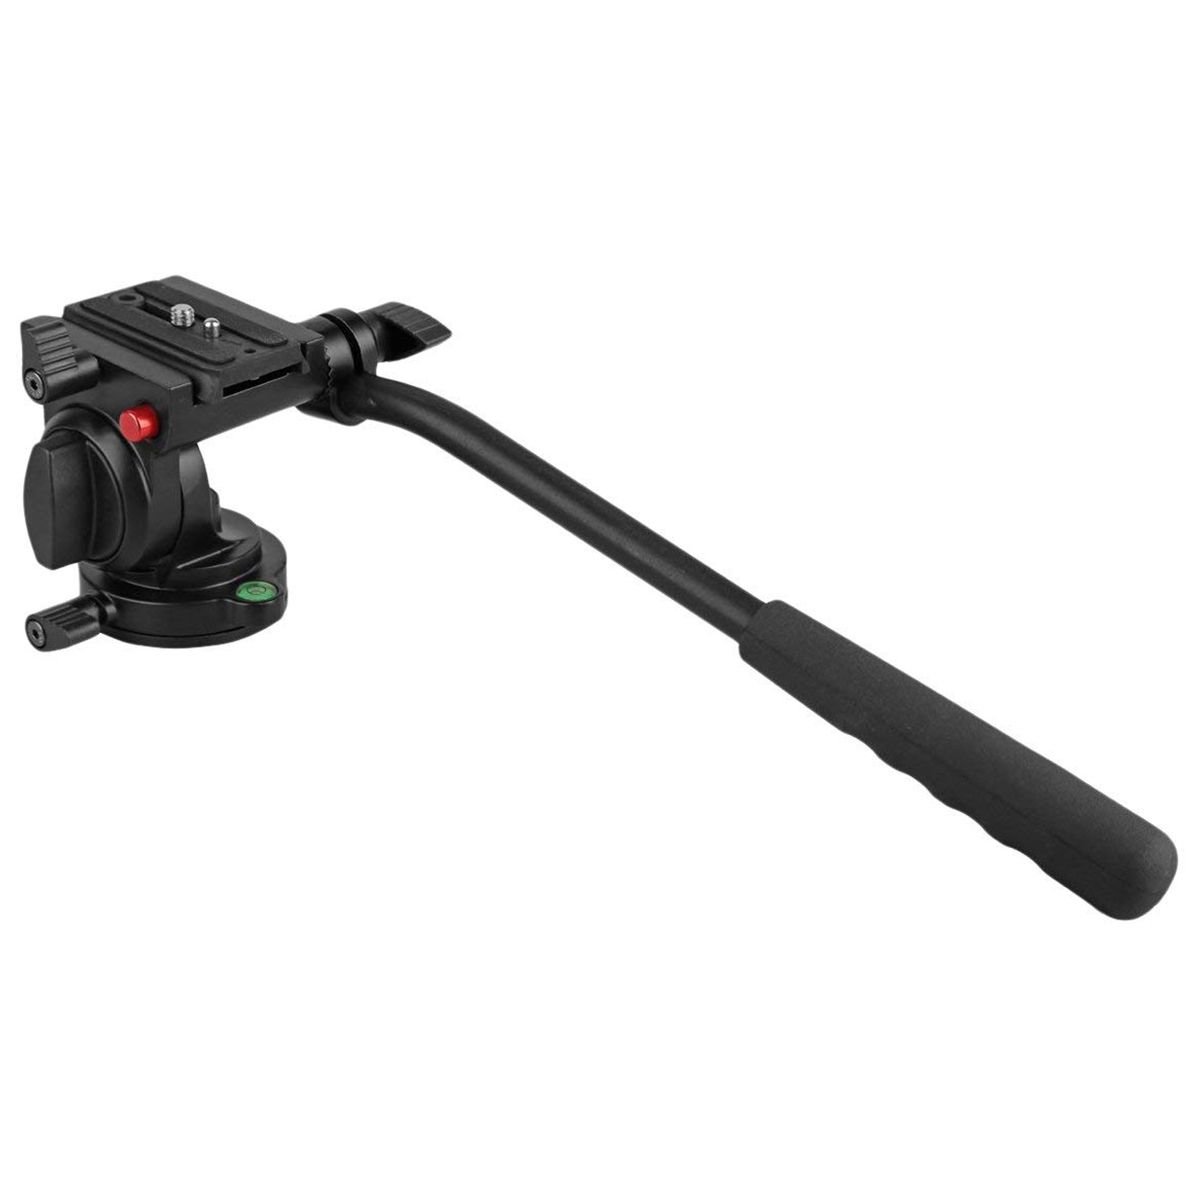 KINGJOY KH 6750 Flexible Aluminum Fluid Video Camera Tripod Head for Canon Nikon with 1/4 inch Thread Monopods with 3/8 inch Thr